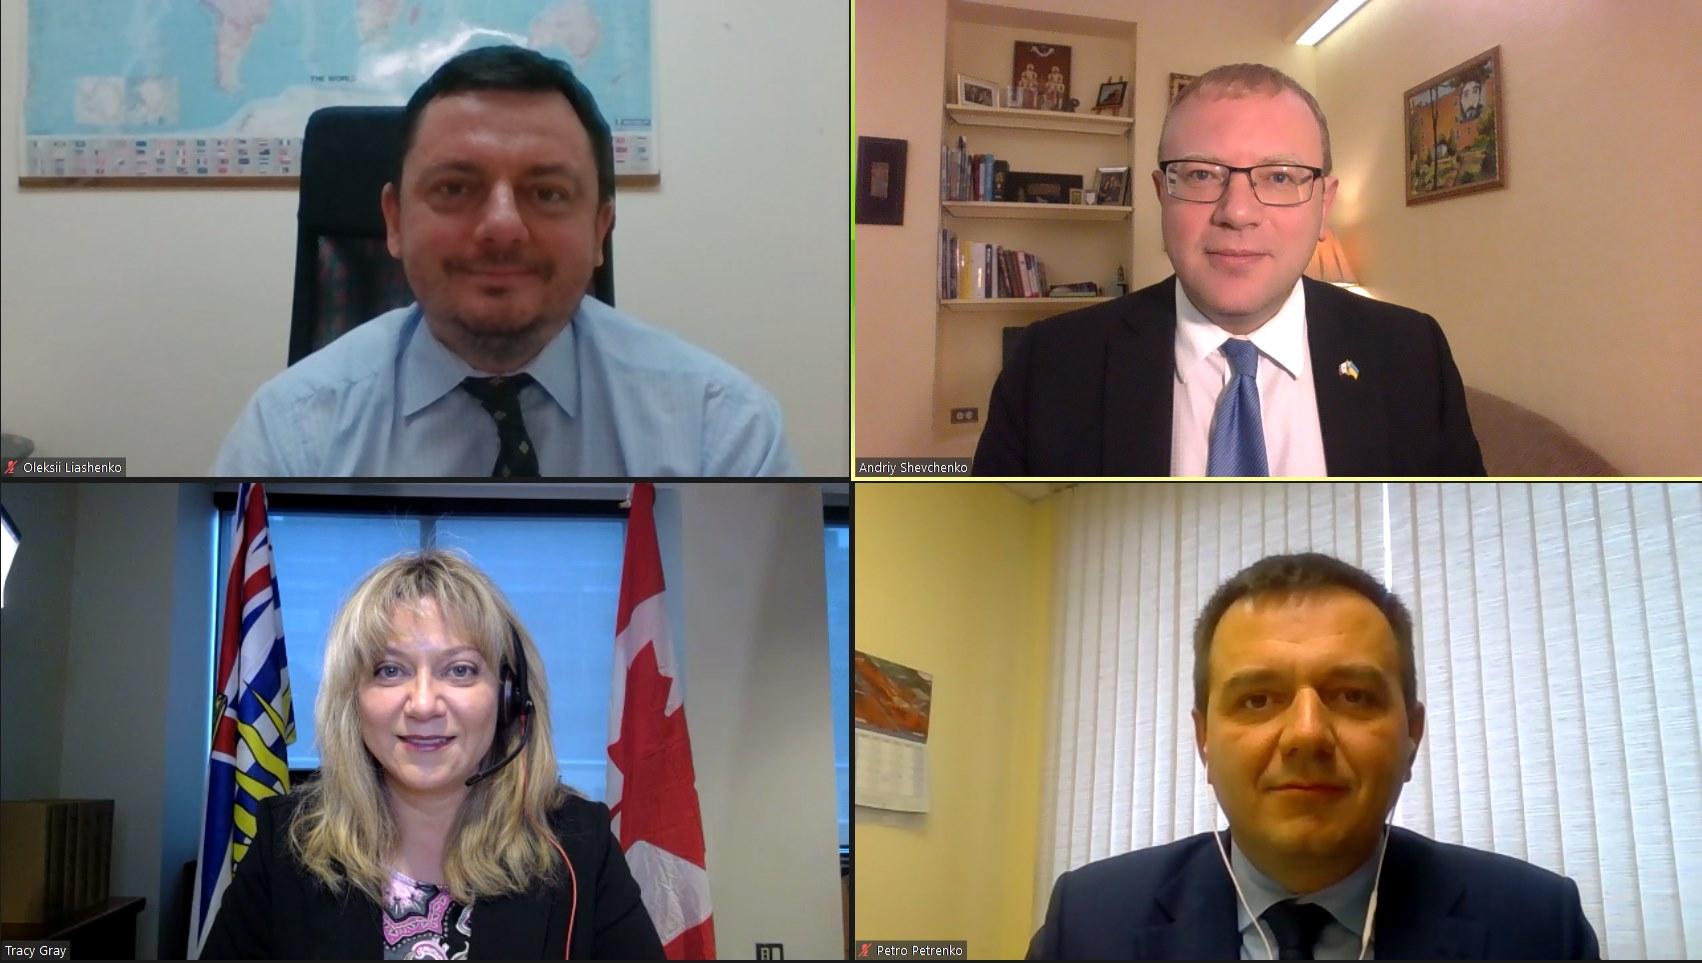 Meeting with Ukrainian Ambassador to Canada Andriy Shevchenko